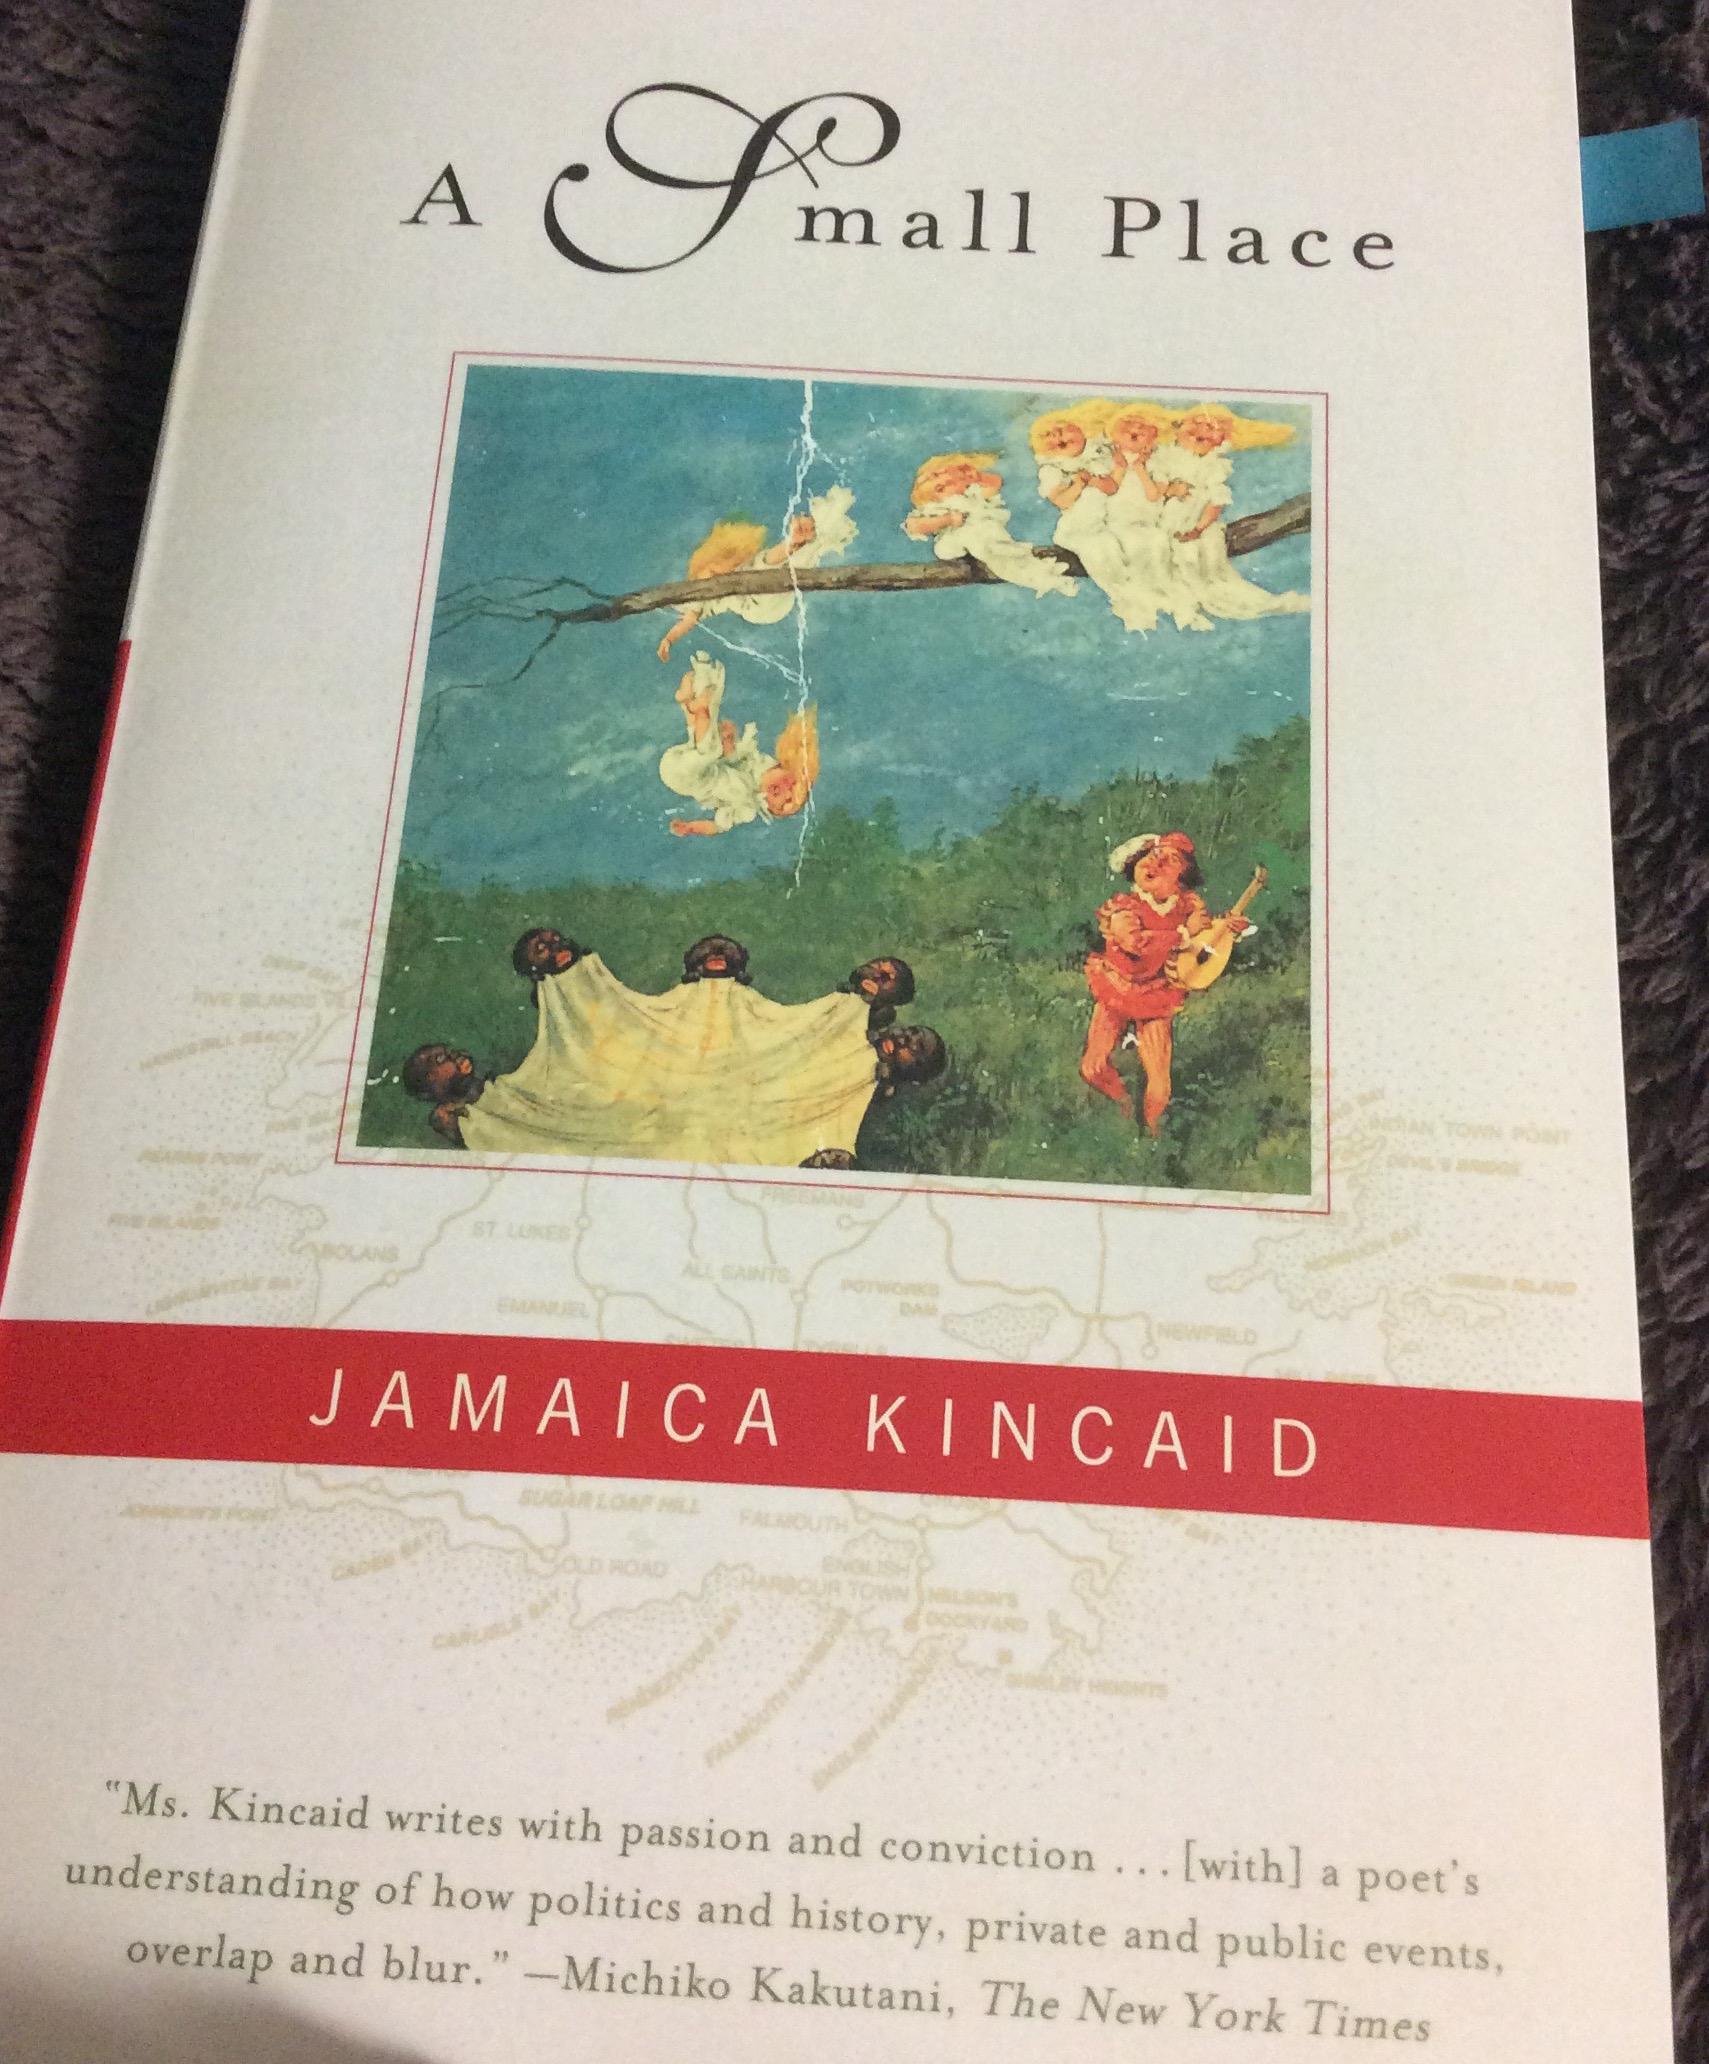 jamaica kincaids essay a small place